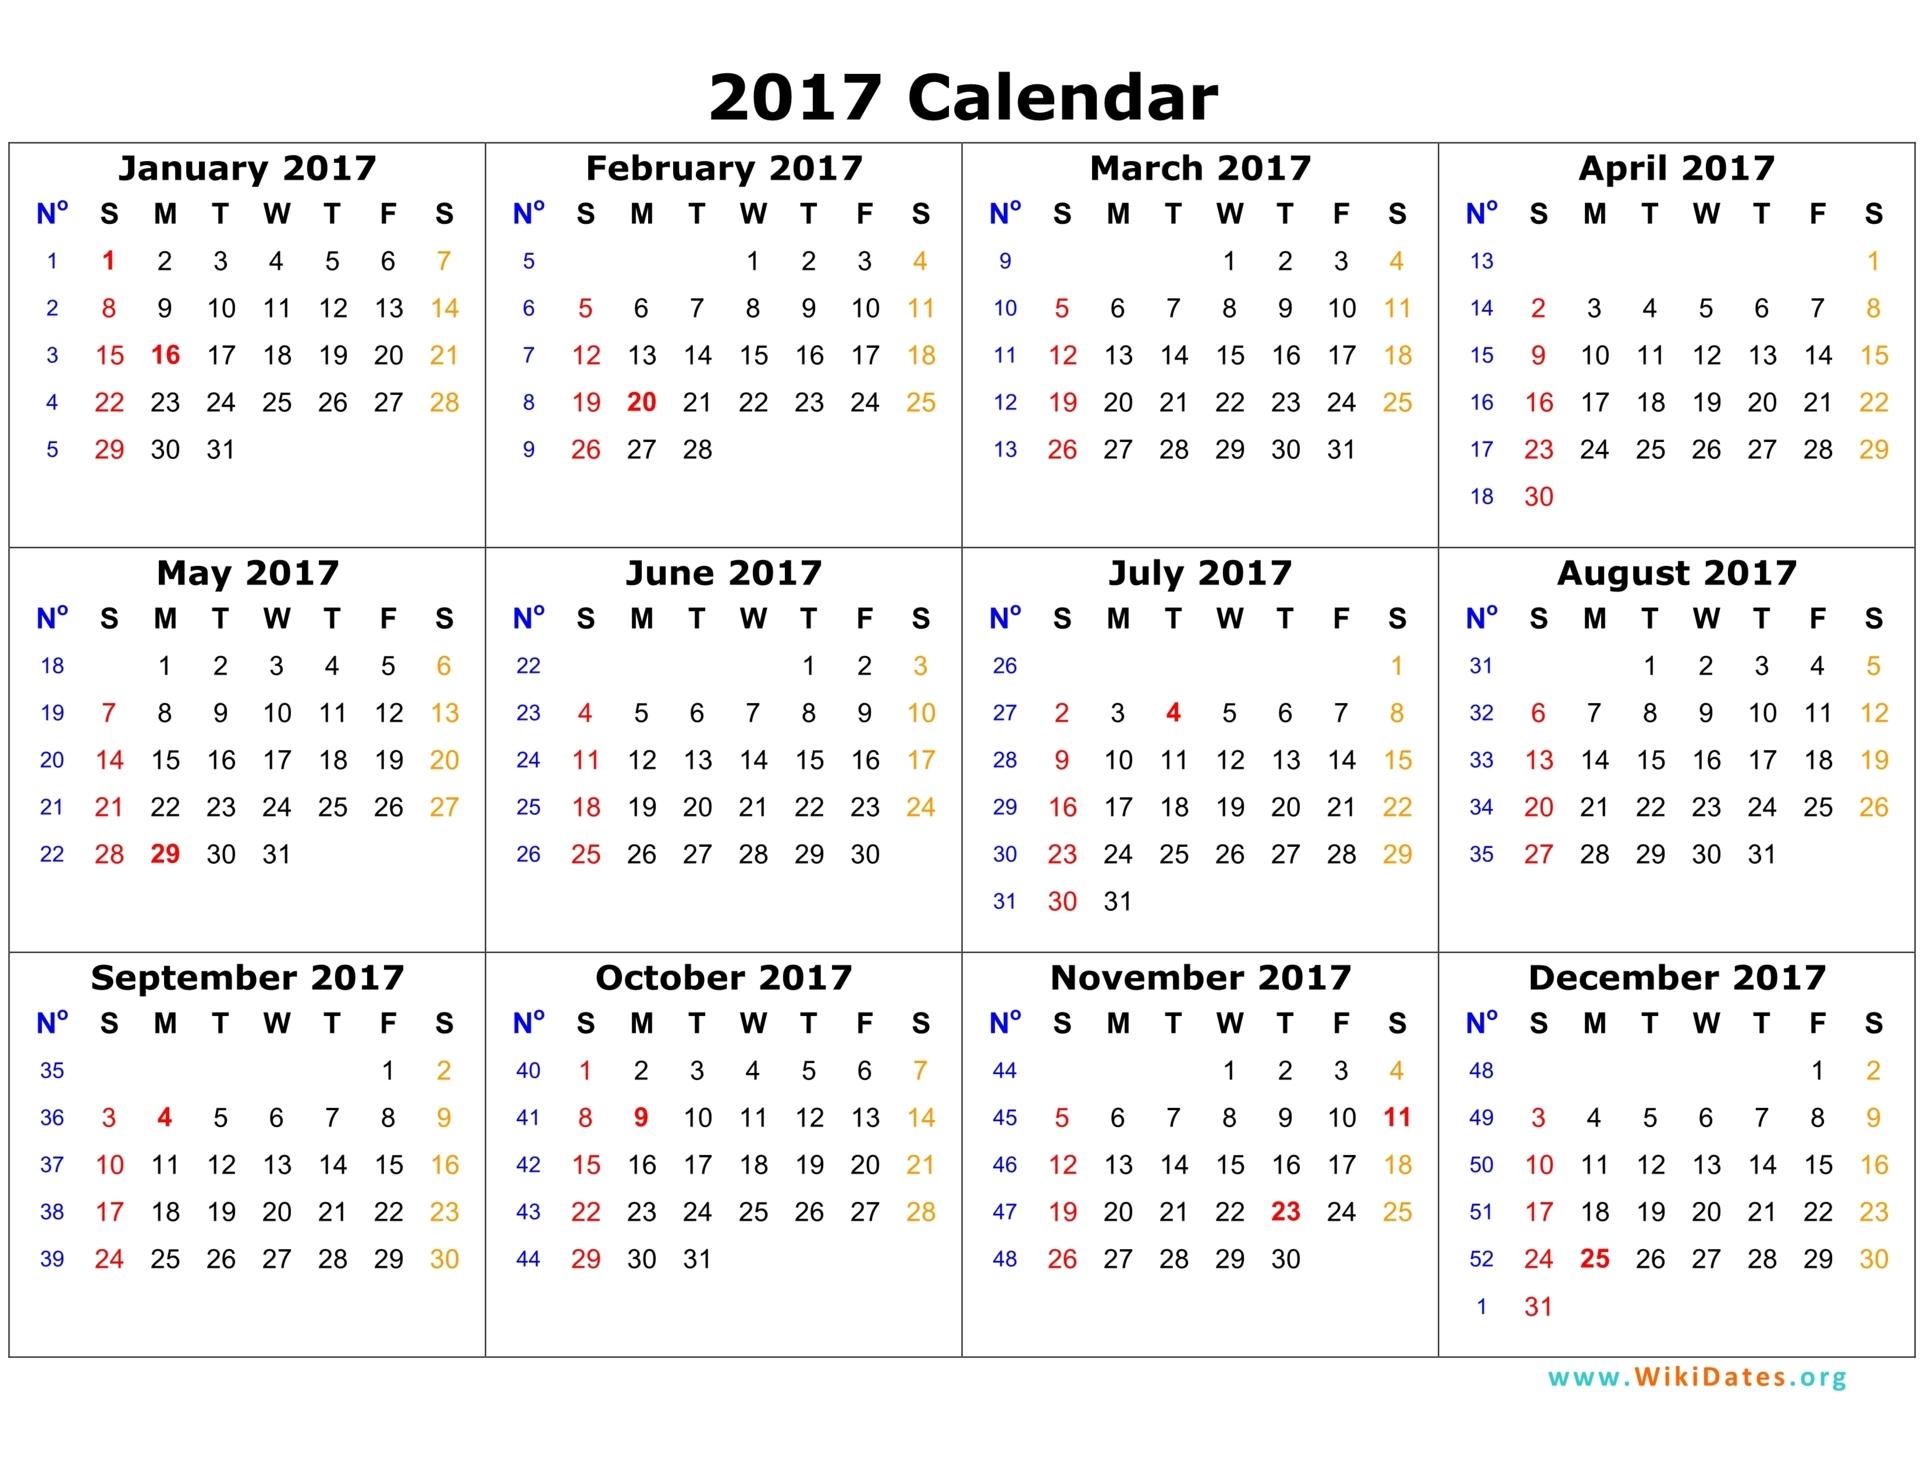 2017 Calendar | WikiDates.org